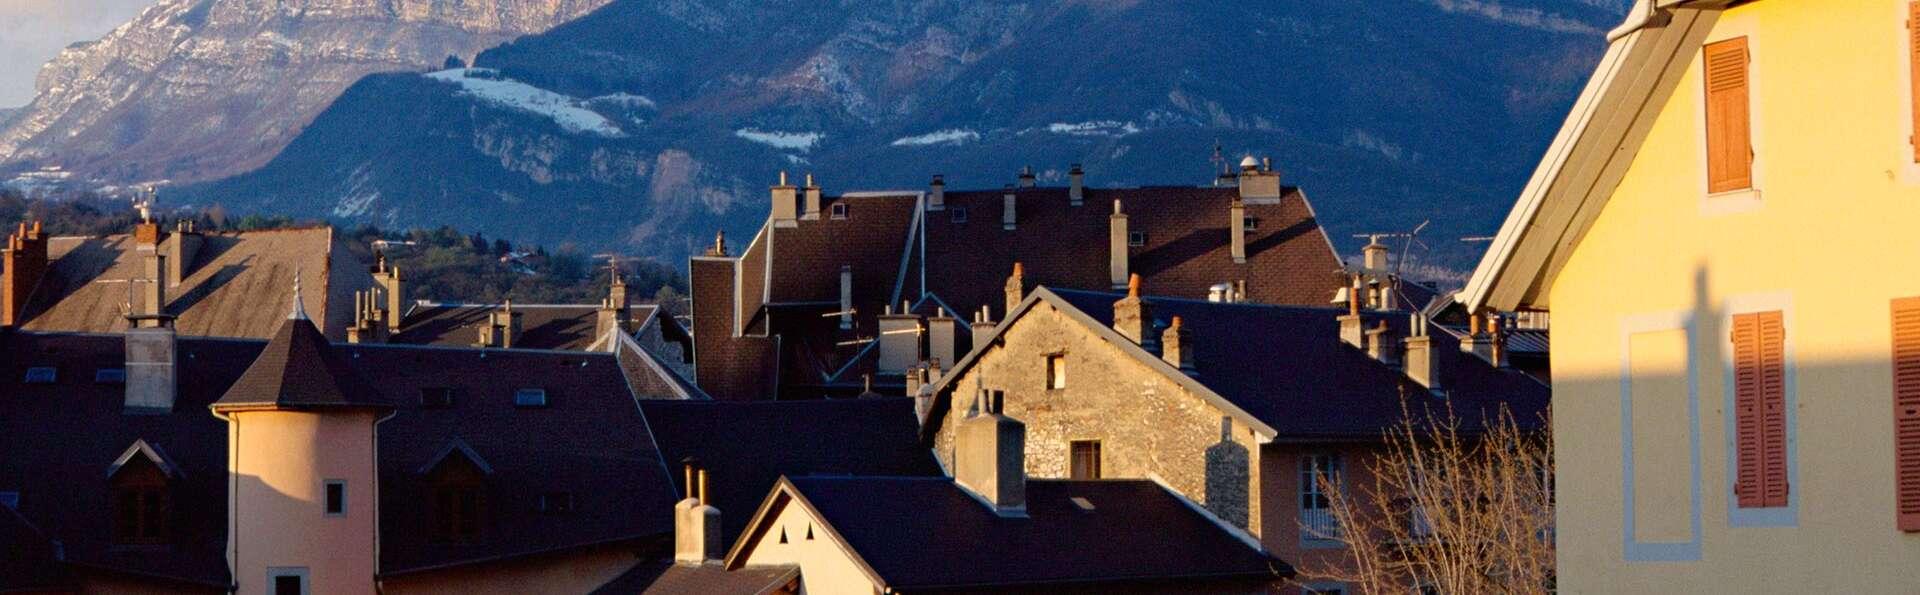 Descubre Saboya alojándote en un hotel de diseño en pleno centro de Chambéry